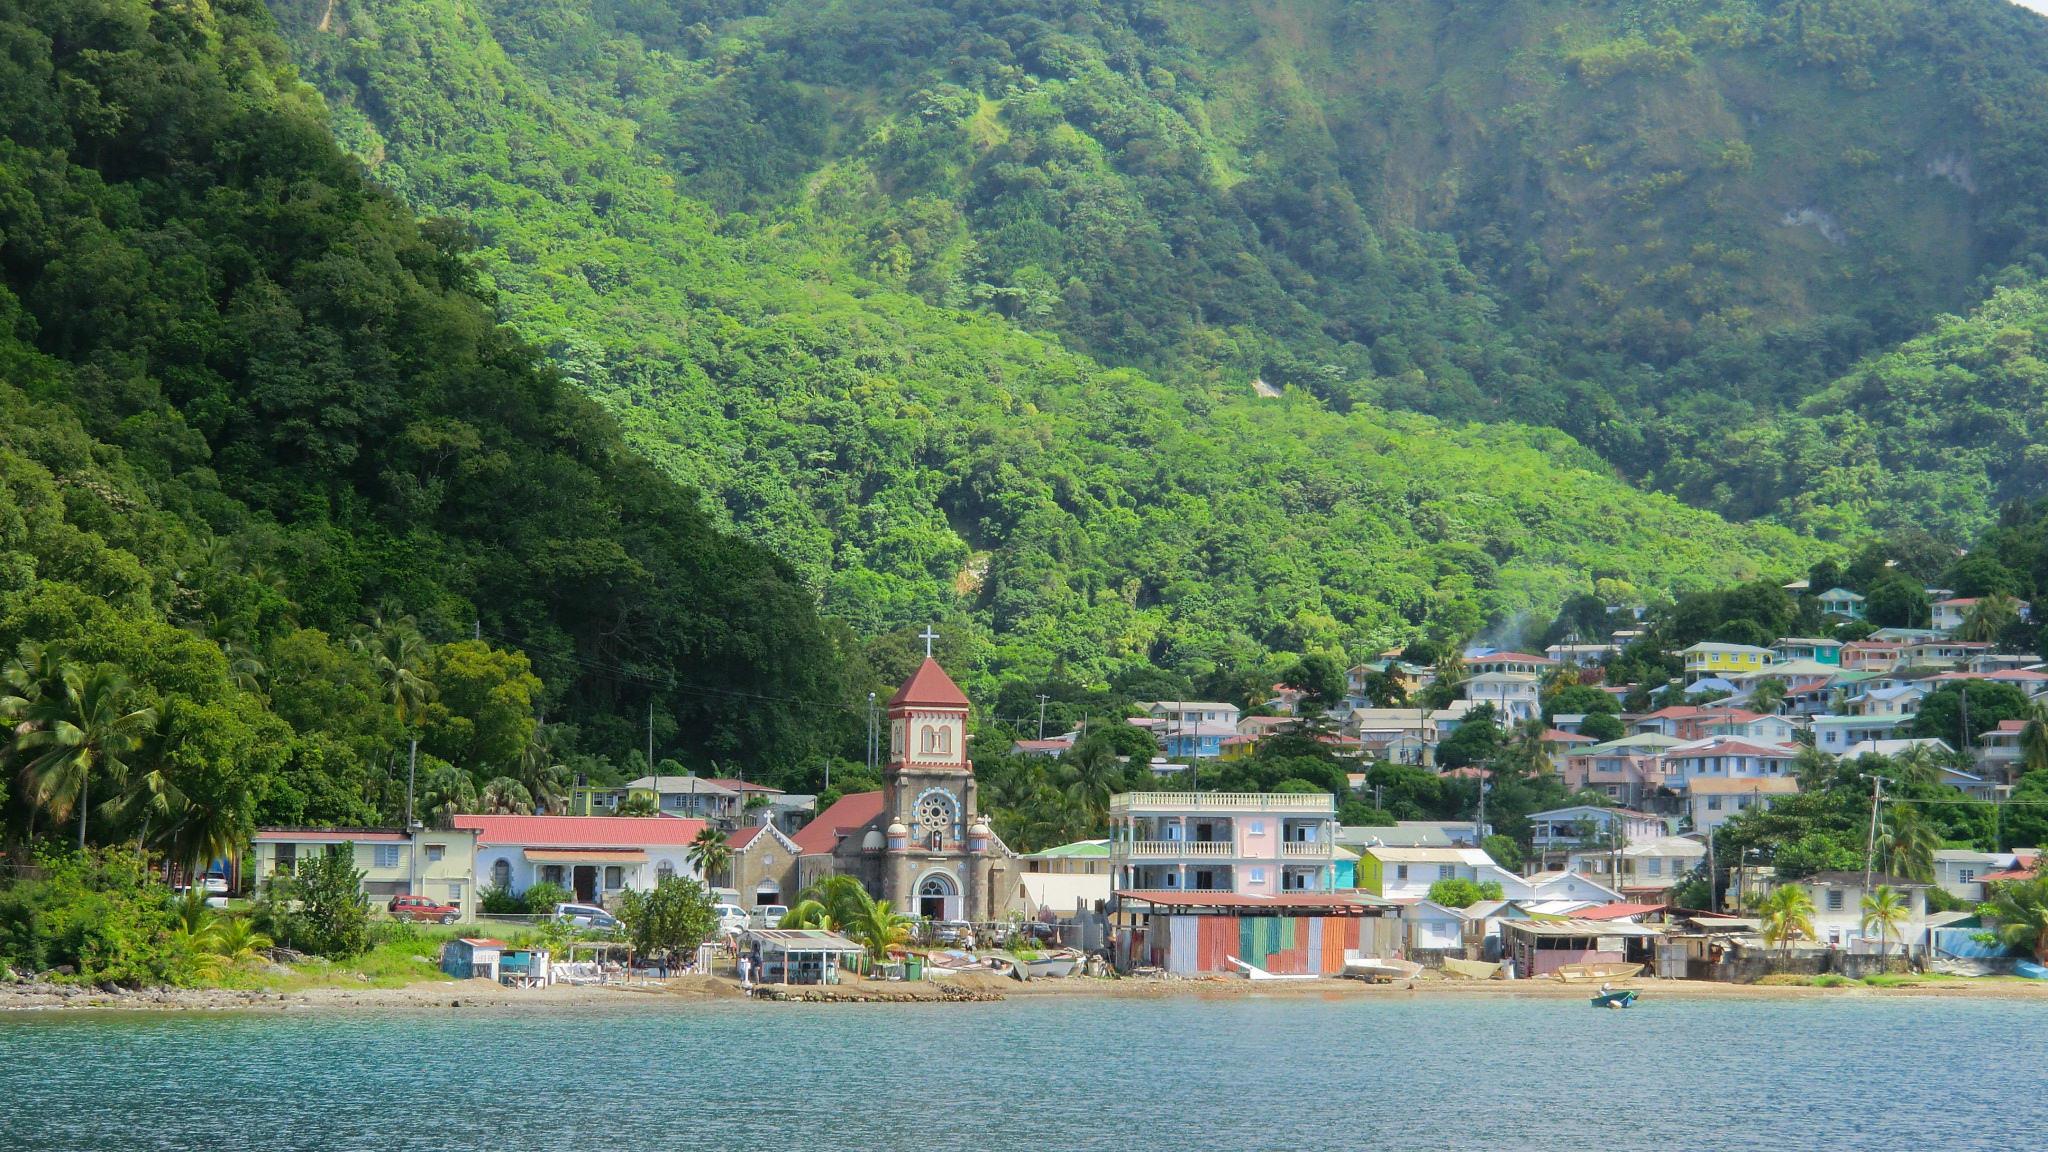 Dominica (Caribbean) - Soufrière - offshore banking